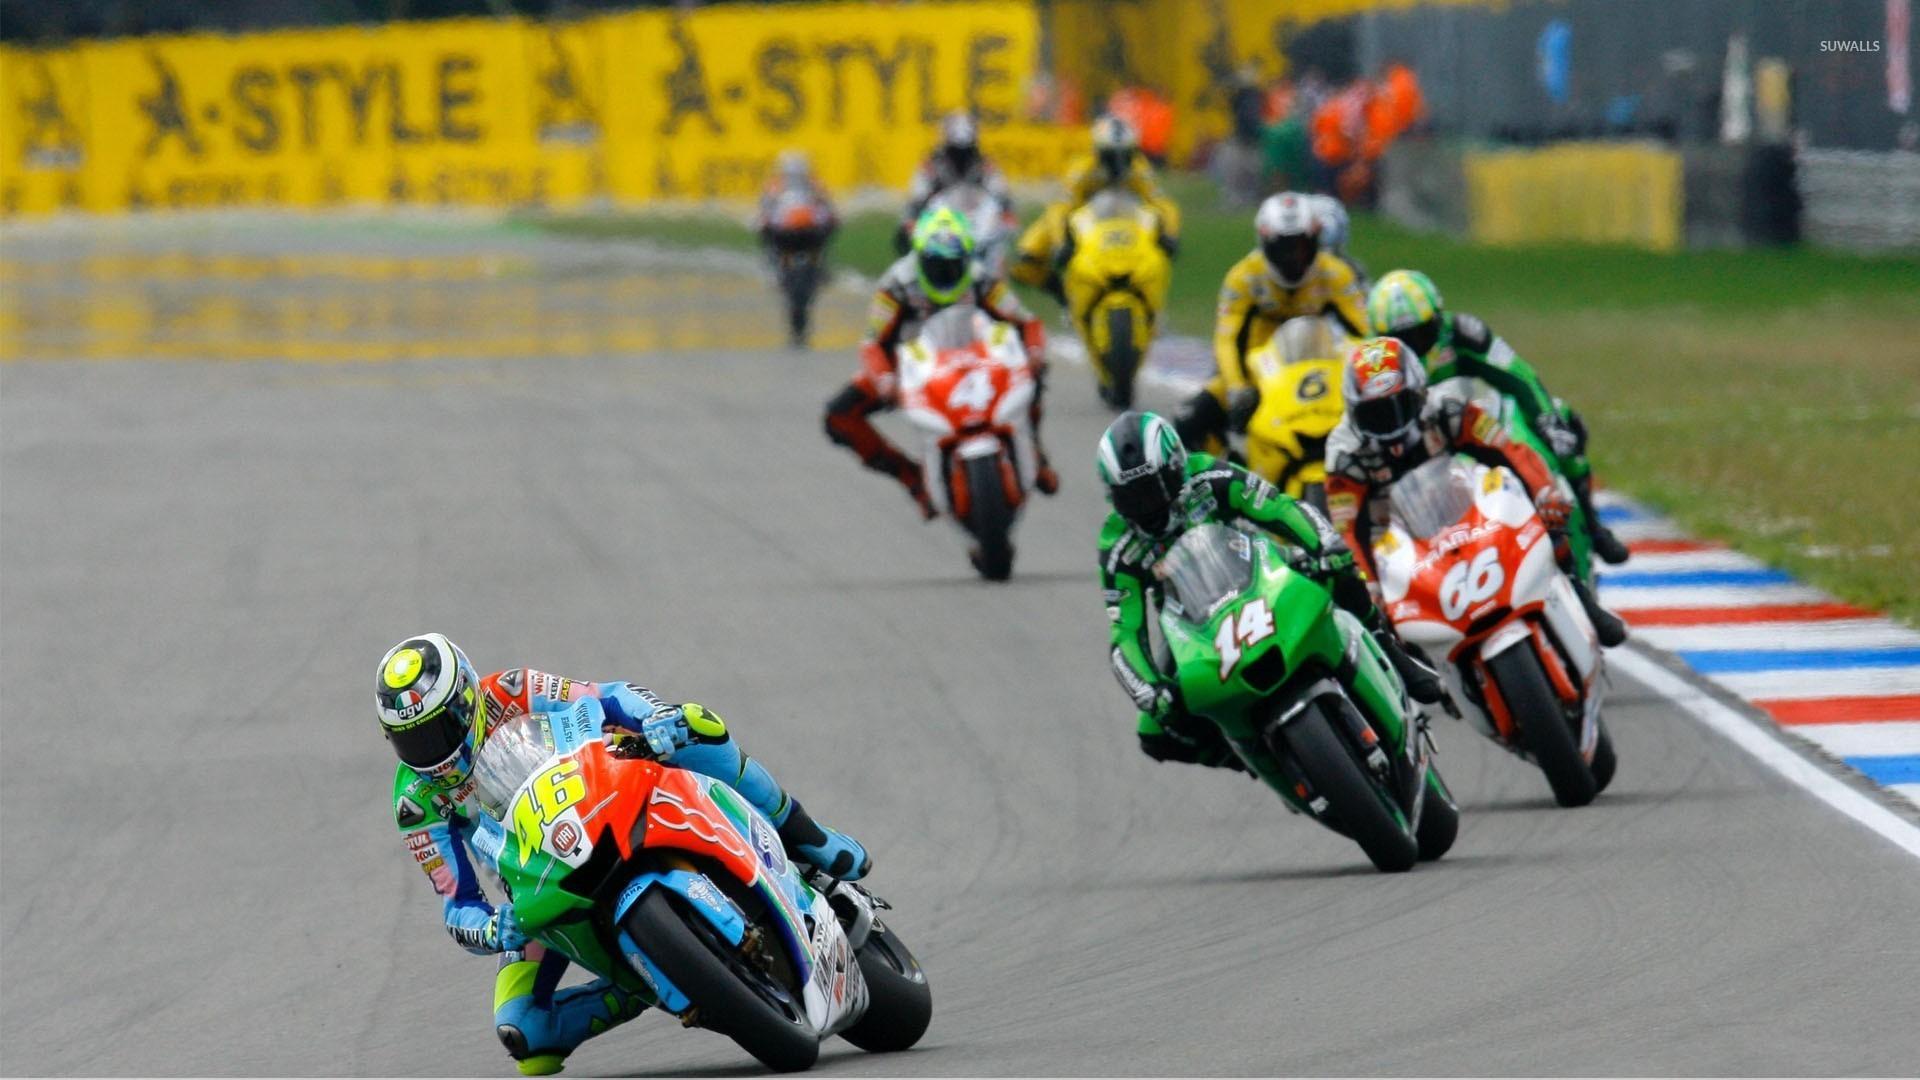 MotoGP [8] wallpaper